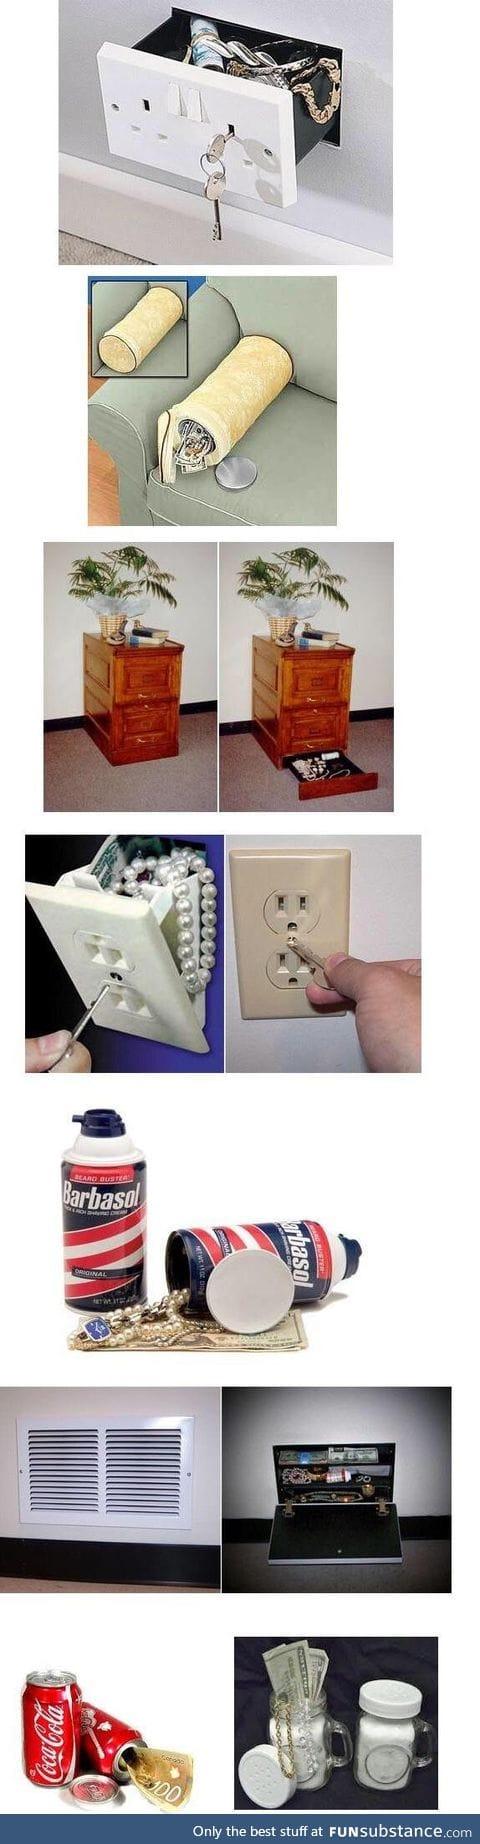 Ways to hide stuff